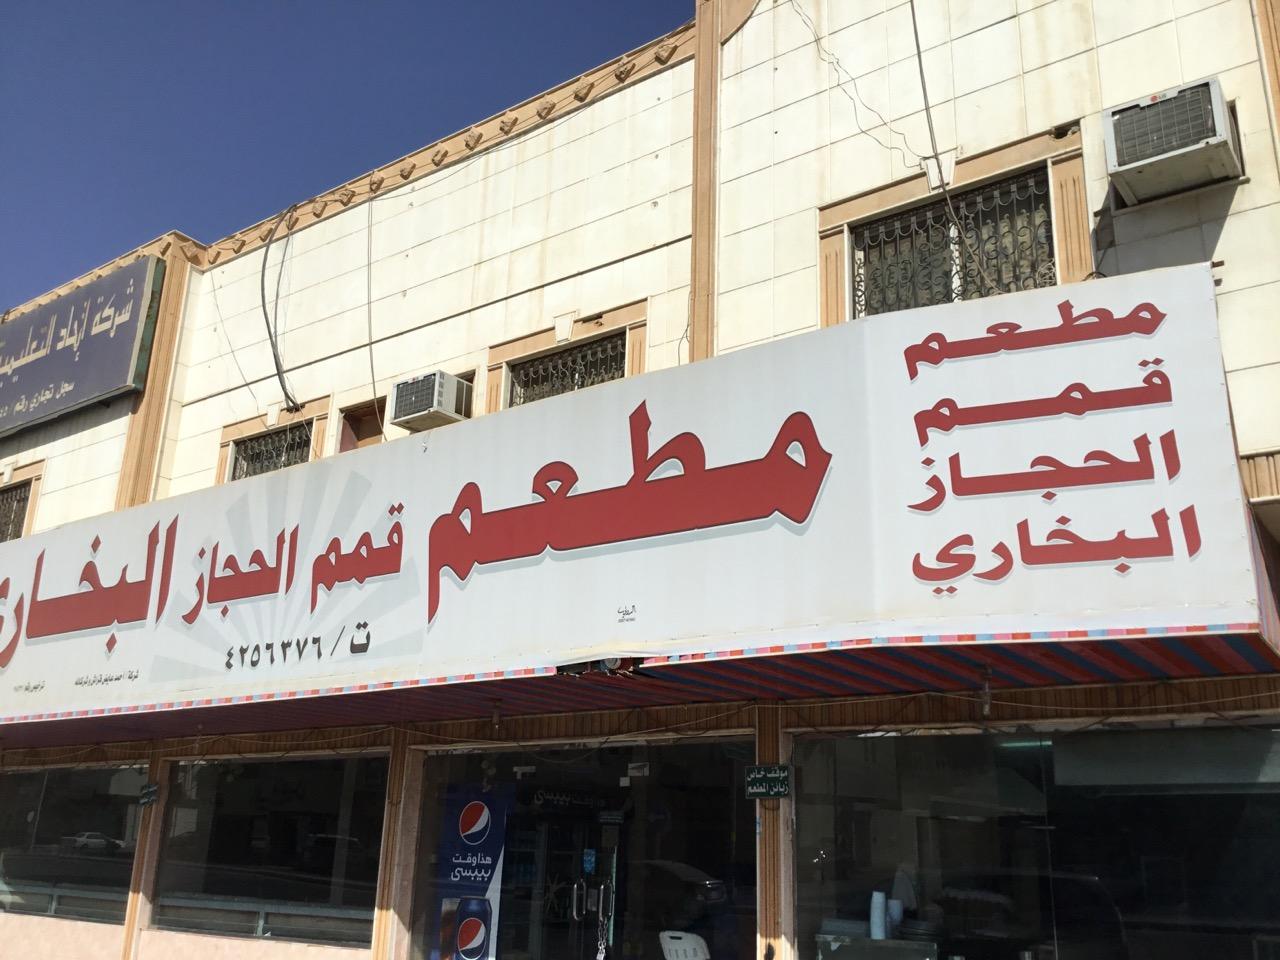 أسعار منيو وفروع ورقم مطعم قمم الحجاز البخاري 2021